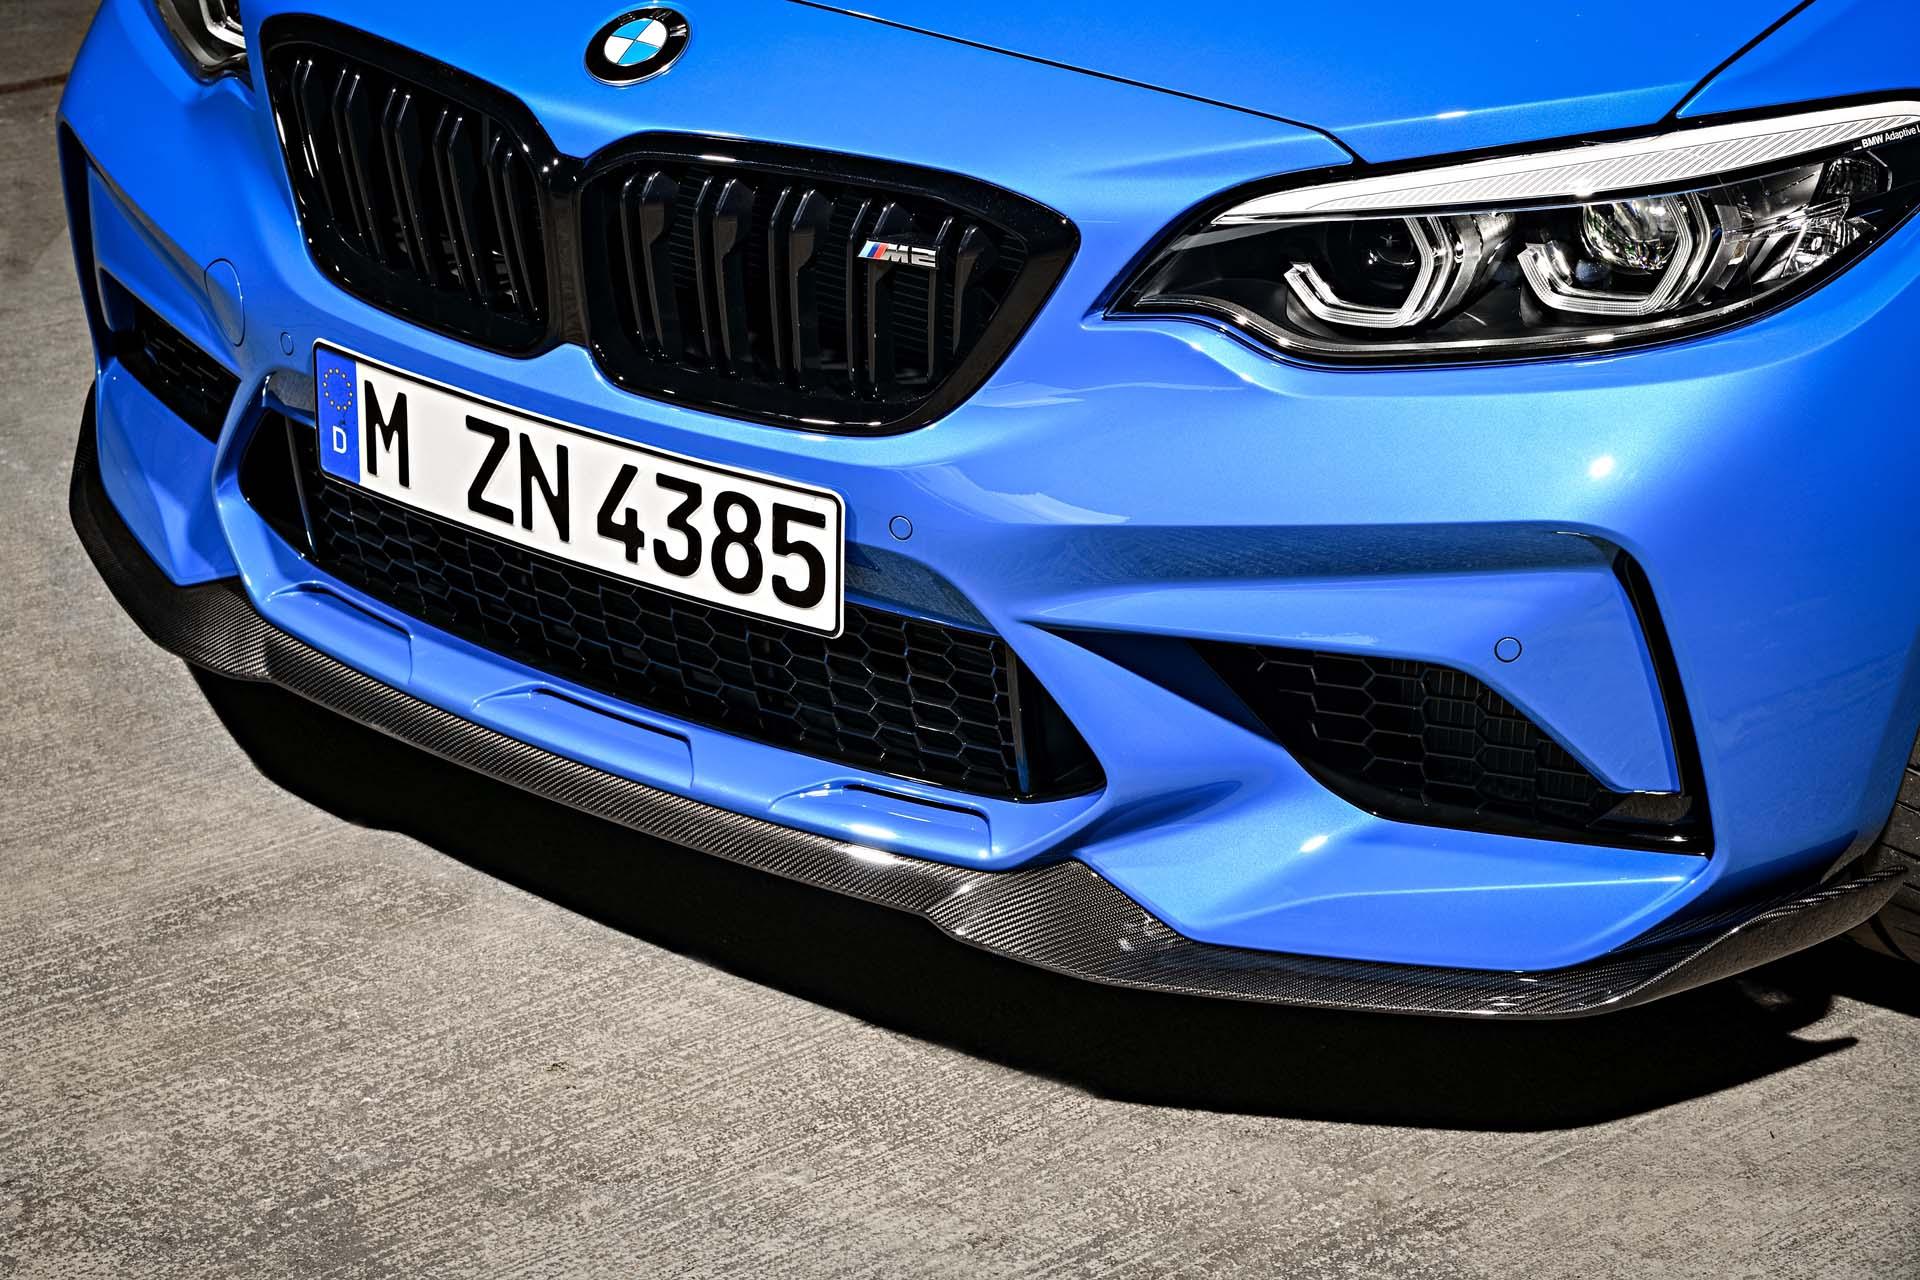 2016 - [BMW] M2 [F87] - Page 11 2020-bmw-2-series_100722776_h